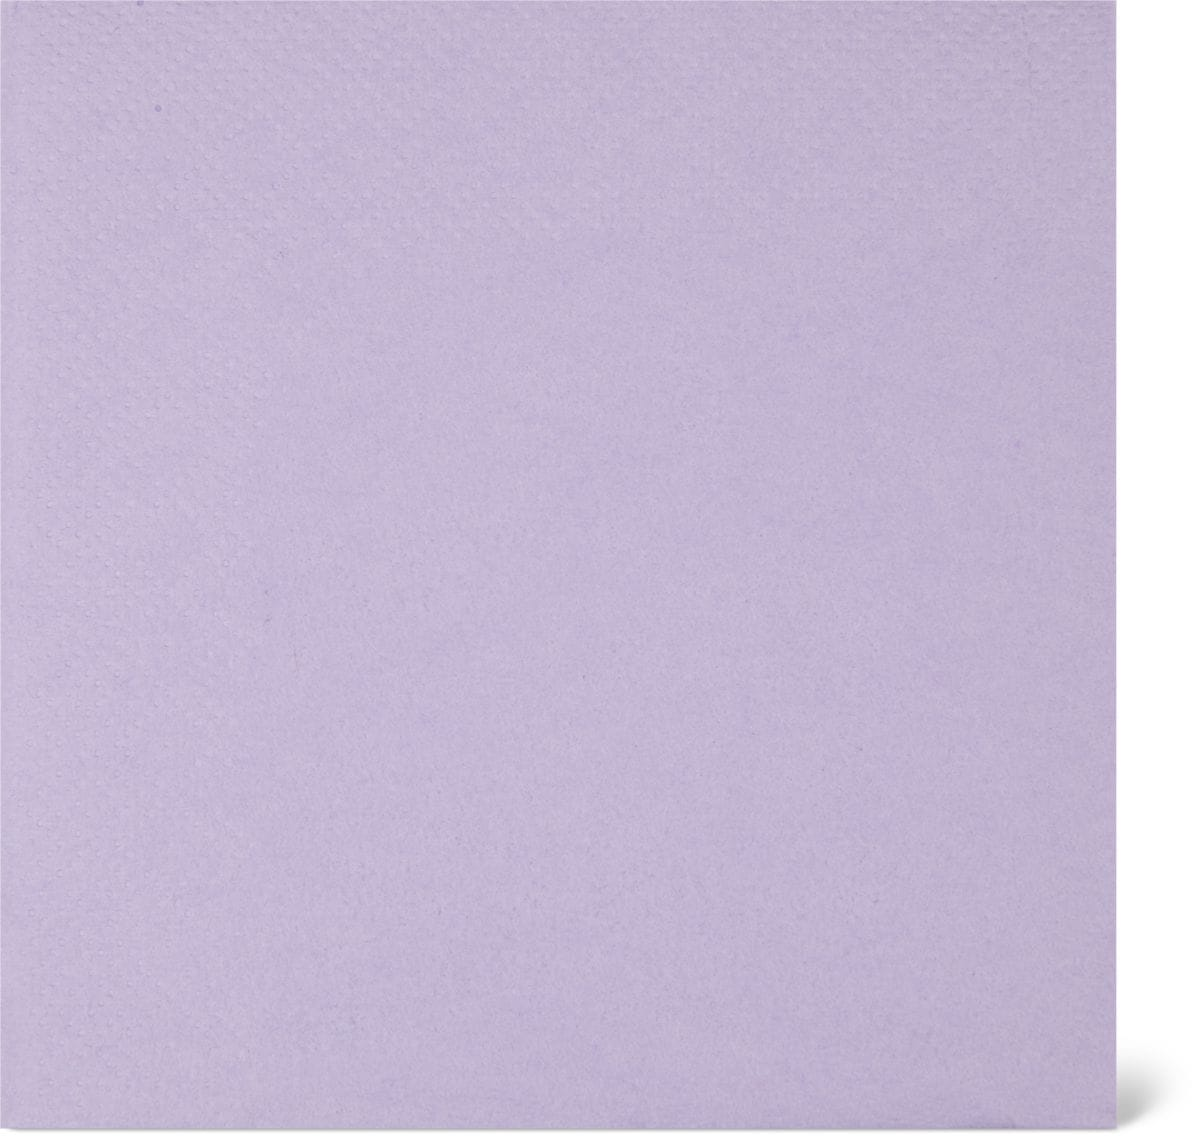 Cucina & Tavola Papierservietten, 24x24cm